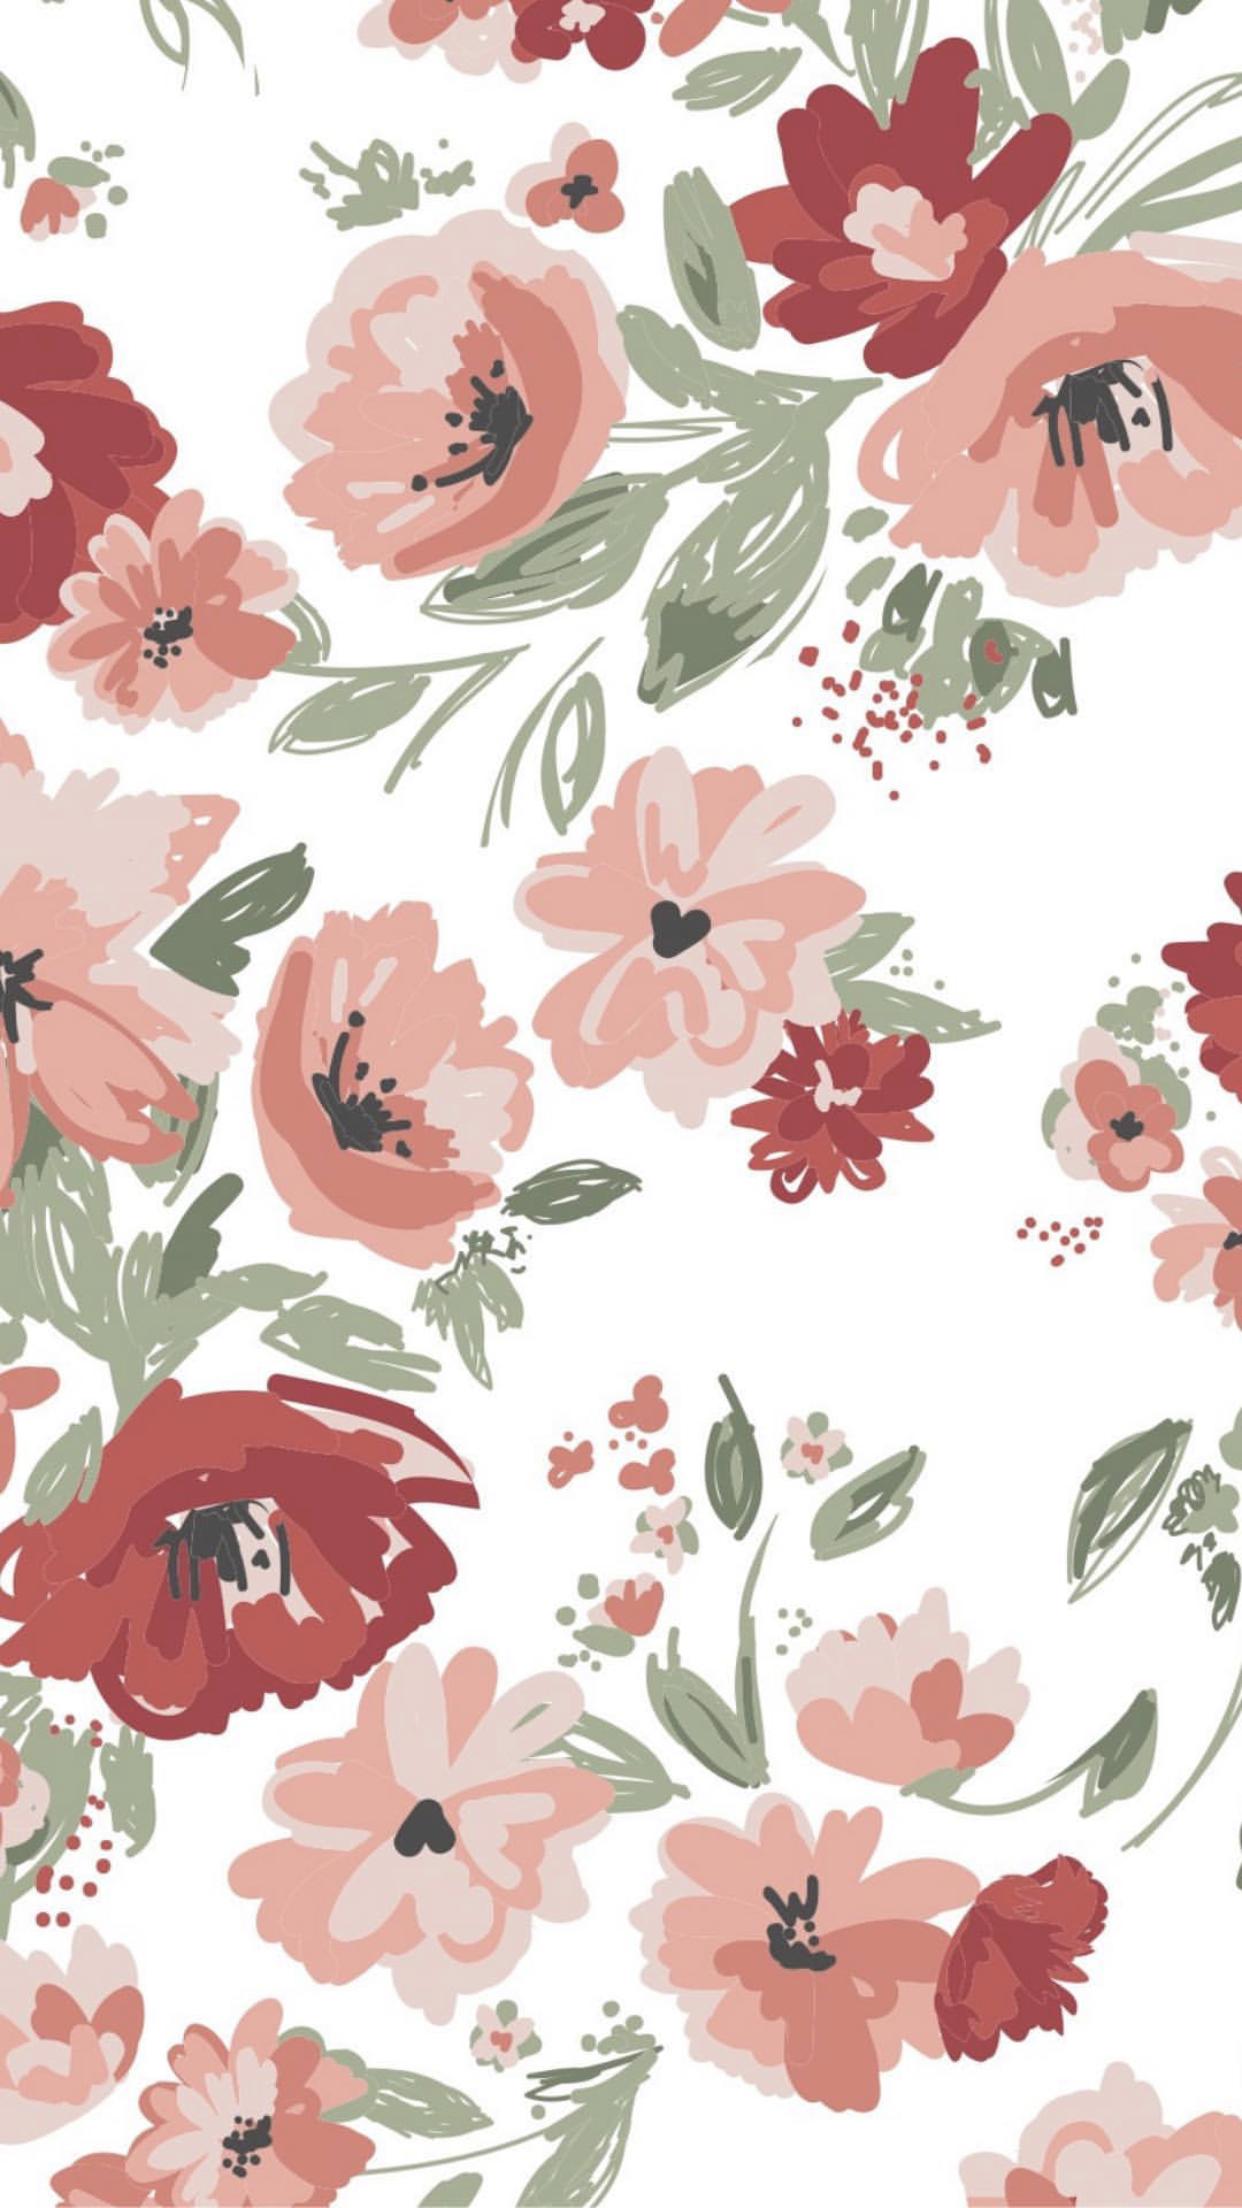 Pin By Juana Ferreyra On Patterns Art Wallpaper Floral Wallpaper Wall Paper Phone